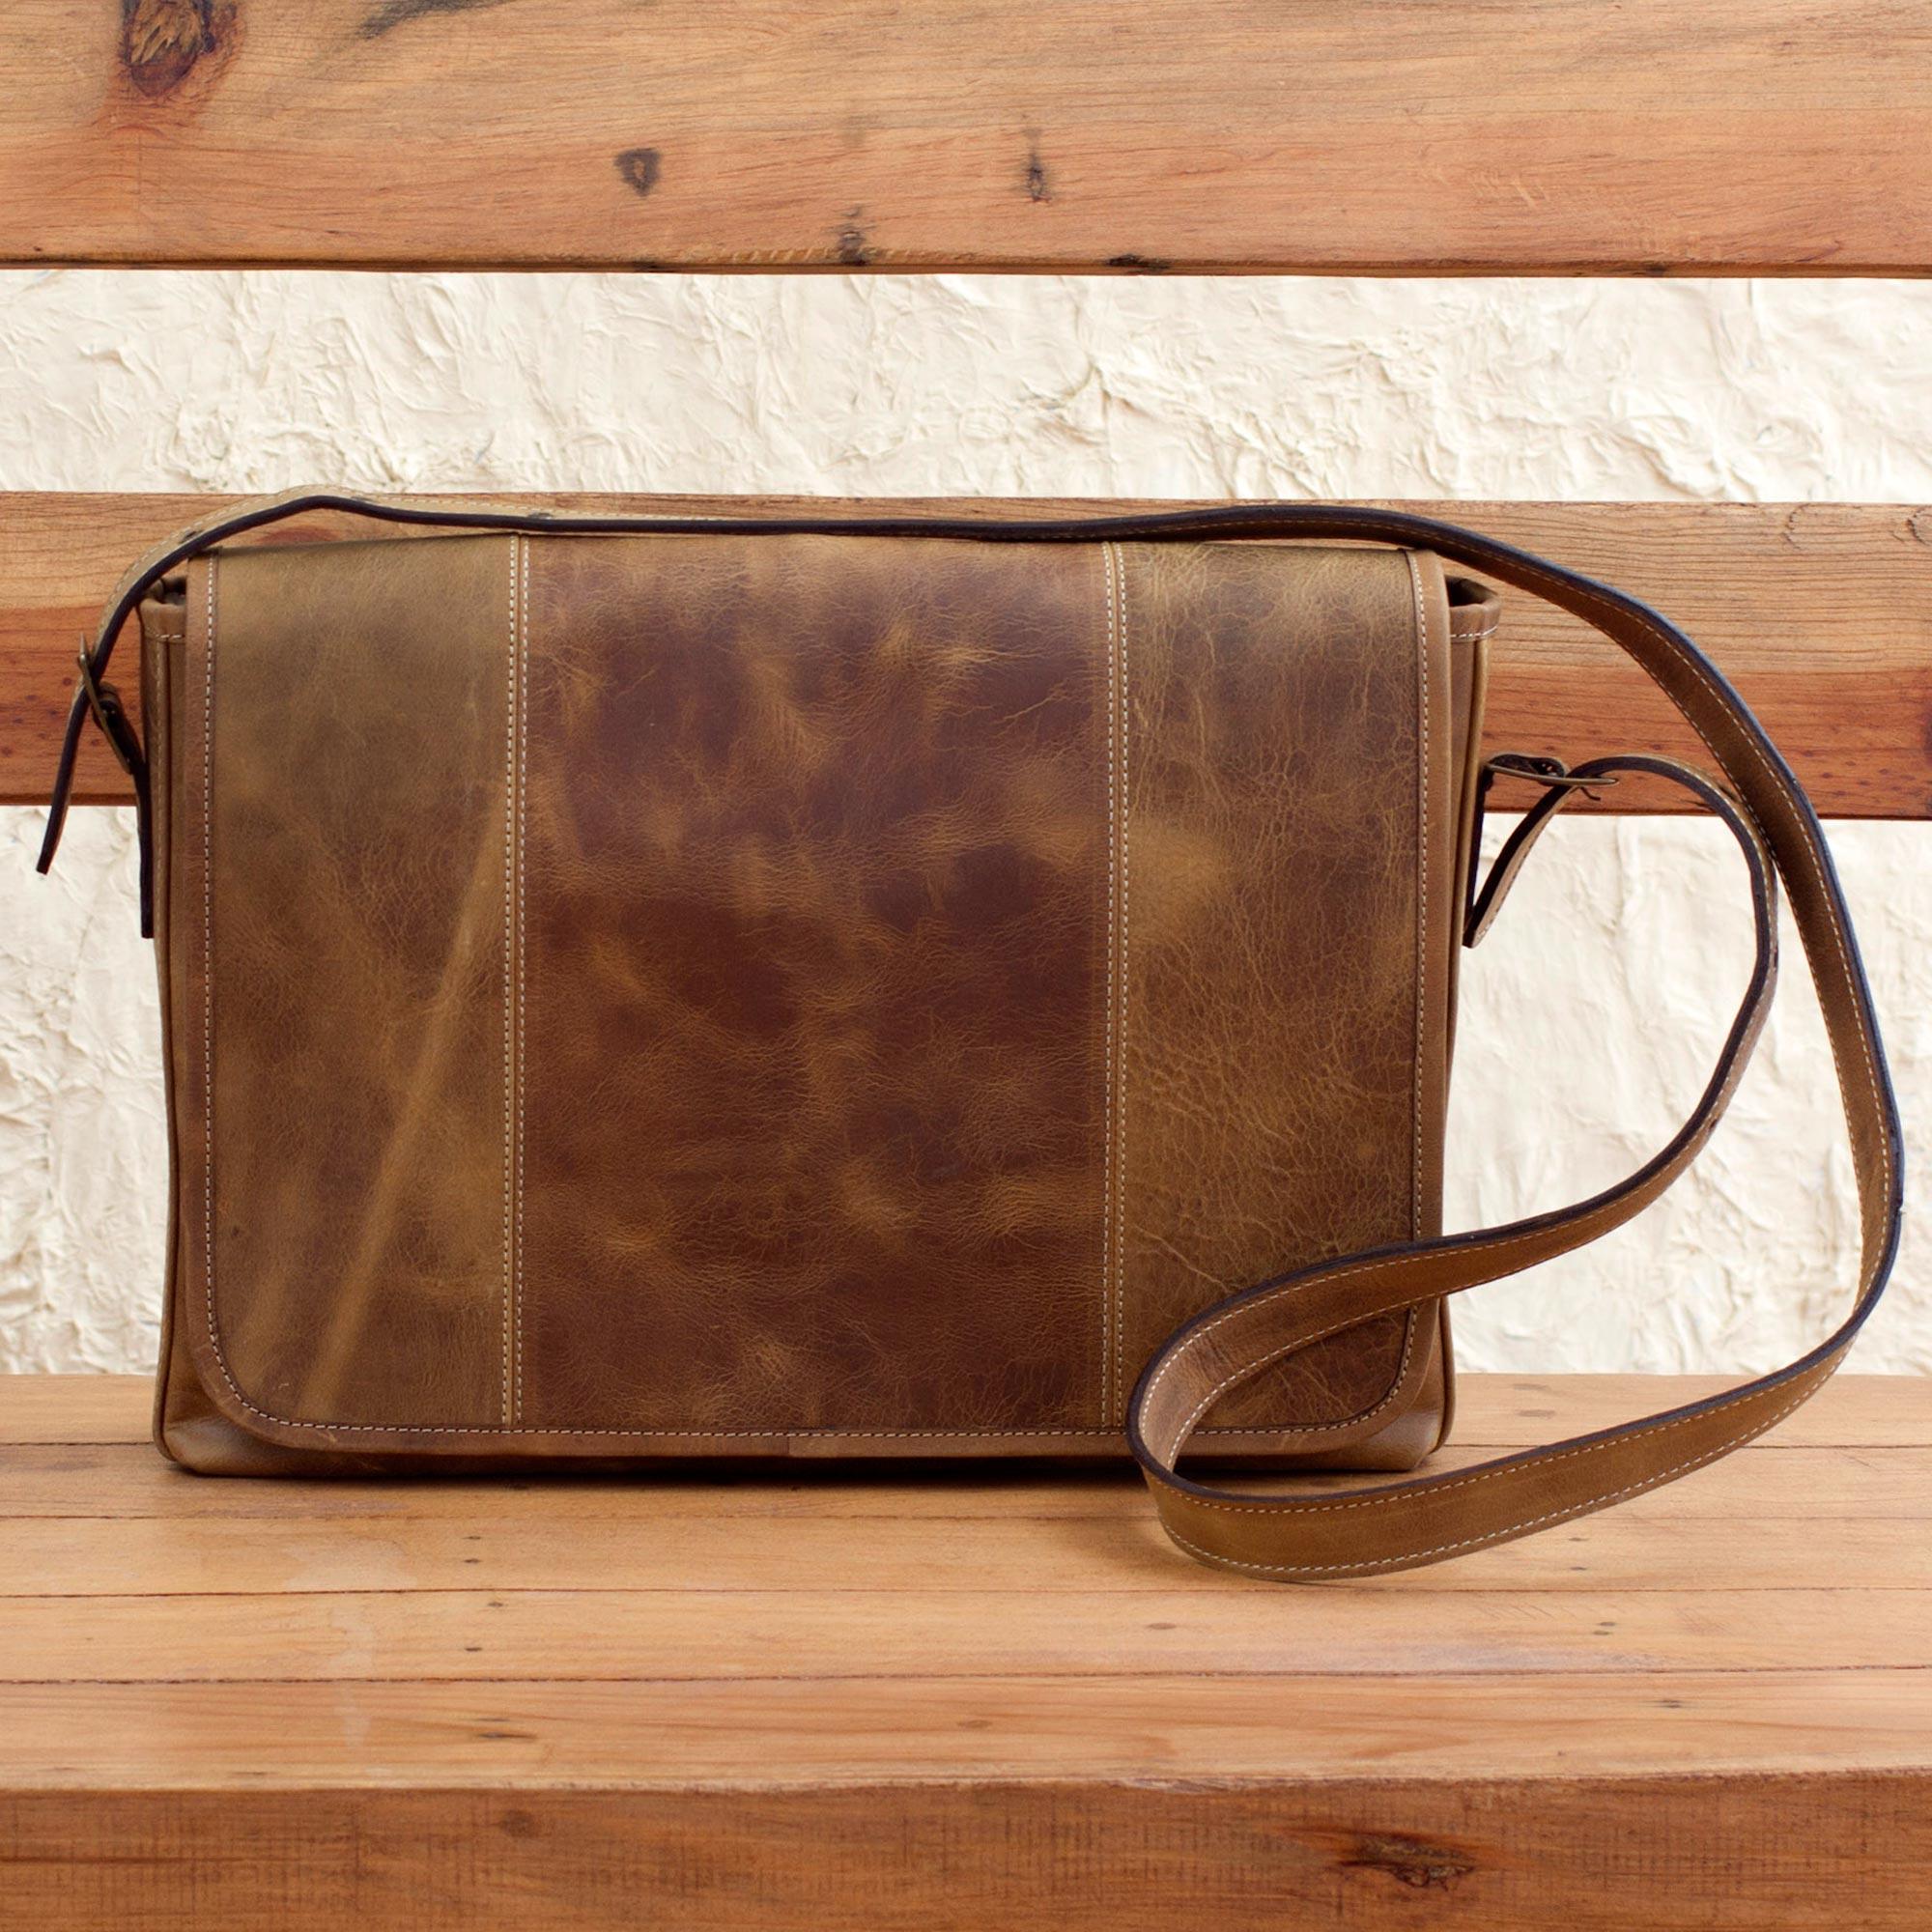 Red boho shoulder bag for boho women PRE-ORDER bohemian bags for women boho purse